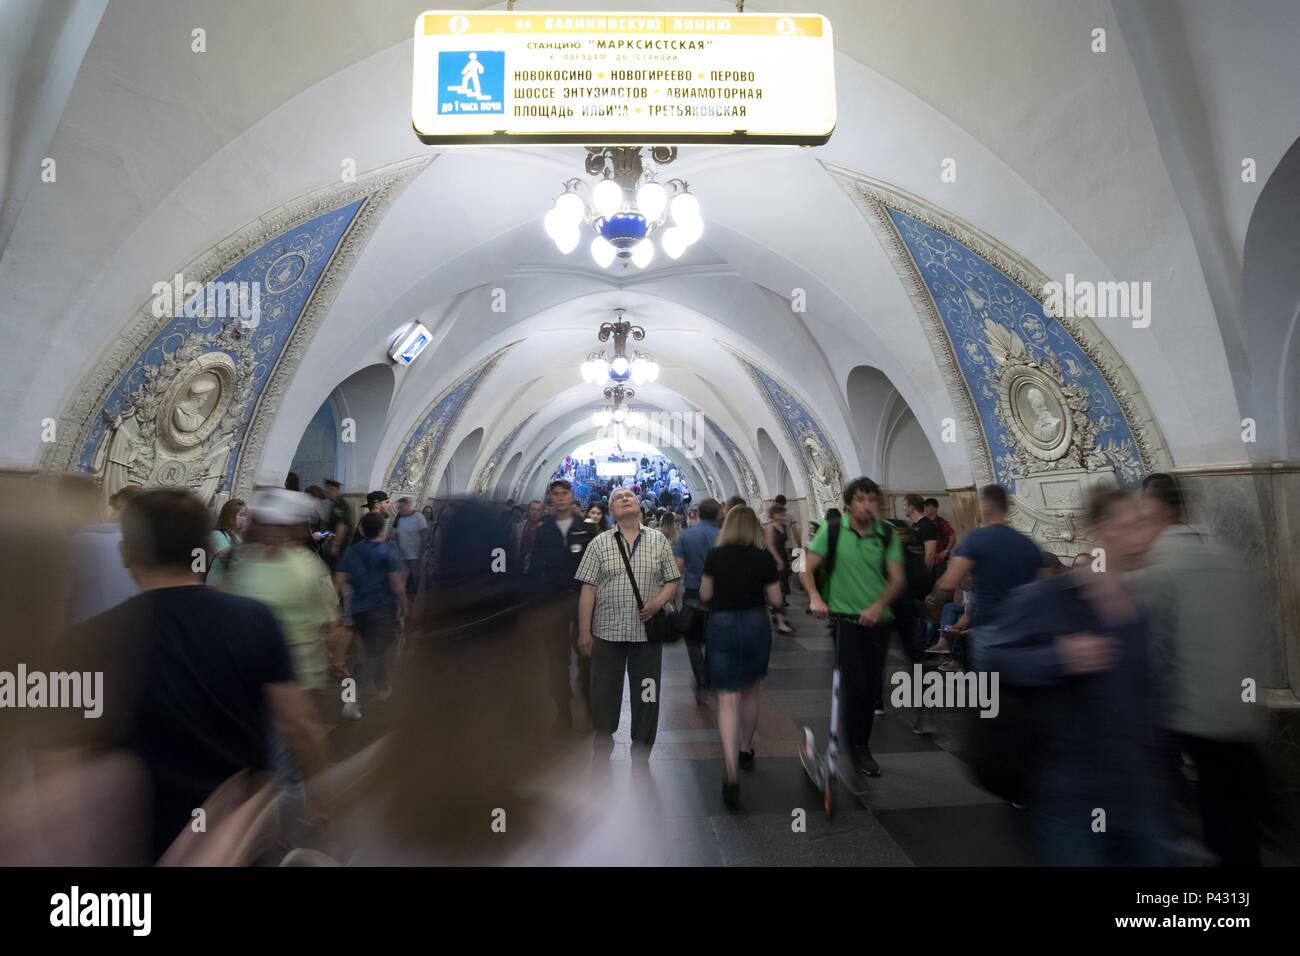 Moscow, Russia. 18th June, 2018. People walk around the Taganskaya metro station. Credit: Federico Gambarini/dpa/Alamy Live News - Stock Image